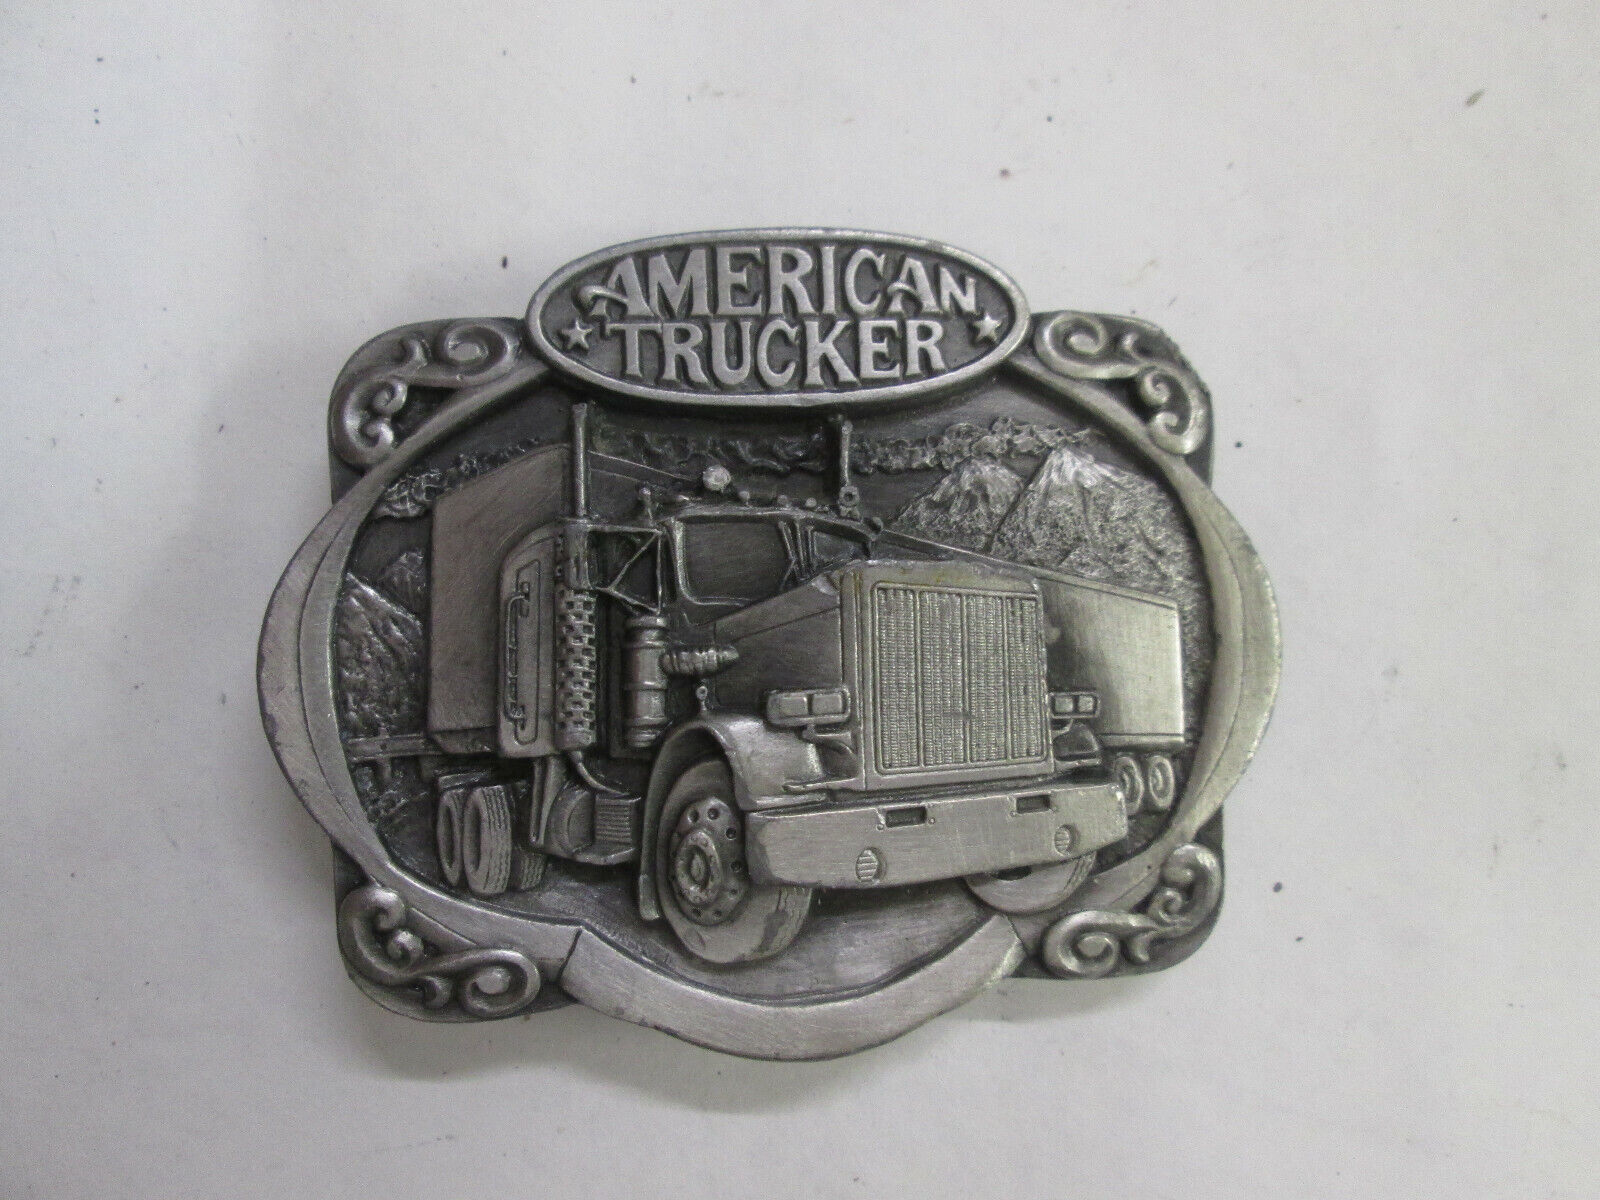 Belt Buckle Gürtelschnalle, American Trucker, Bergamot Brass Works, Vintage 1985